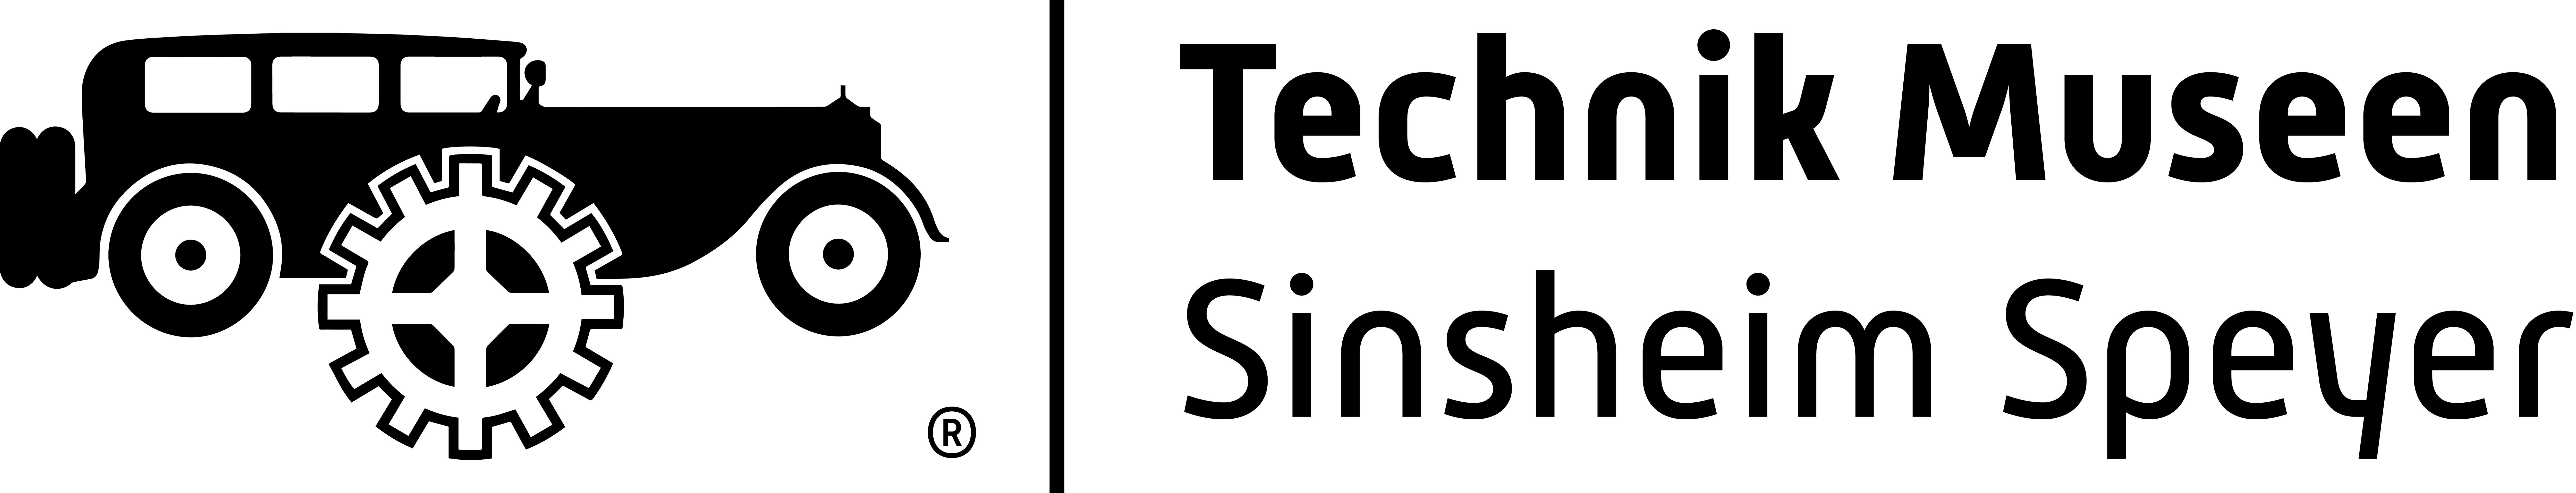 Technik Museum Speyer Logo.png